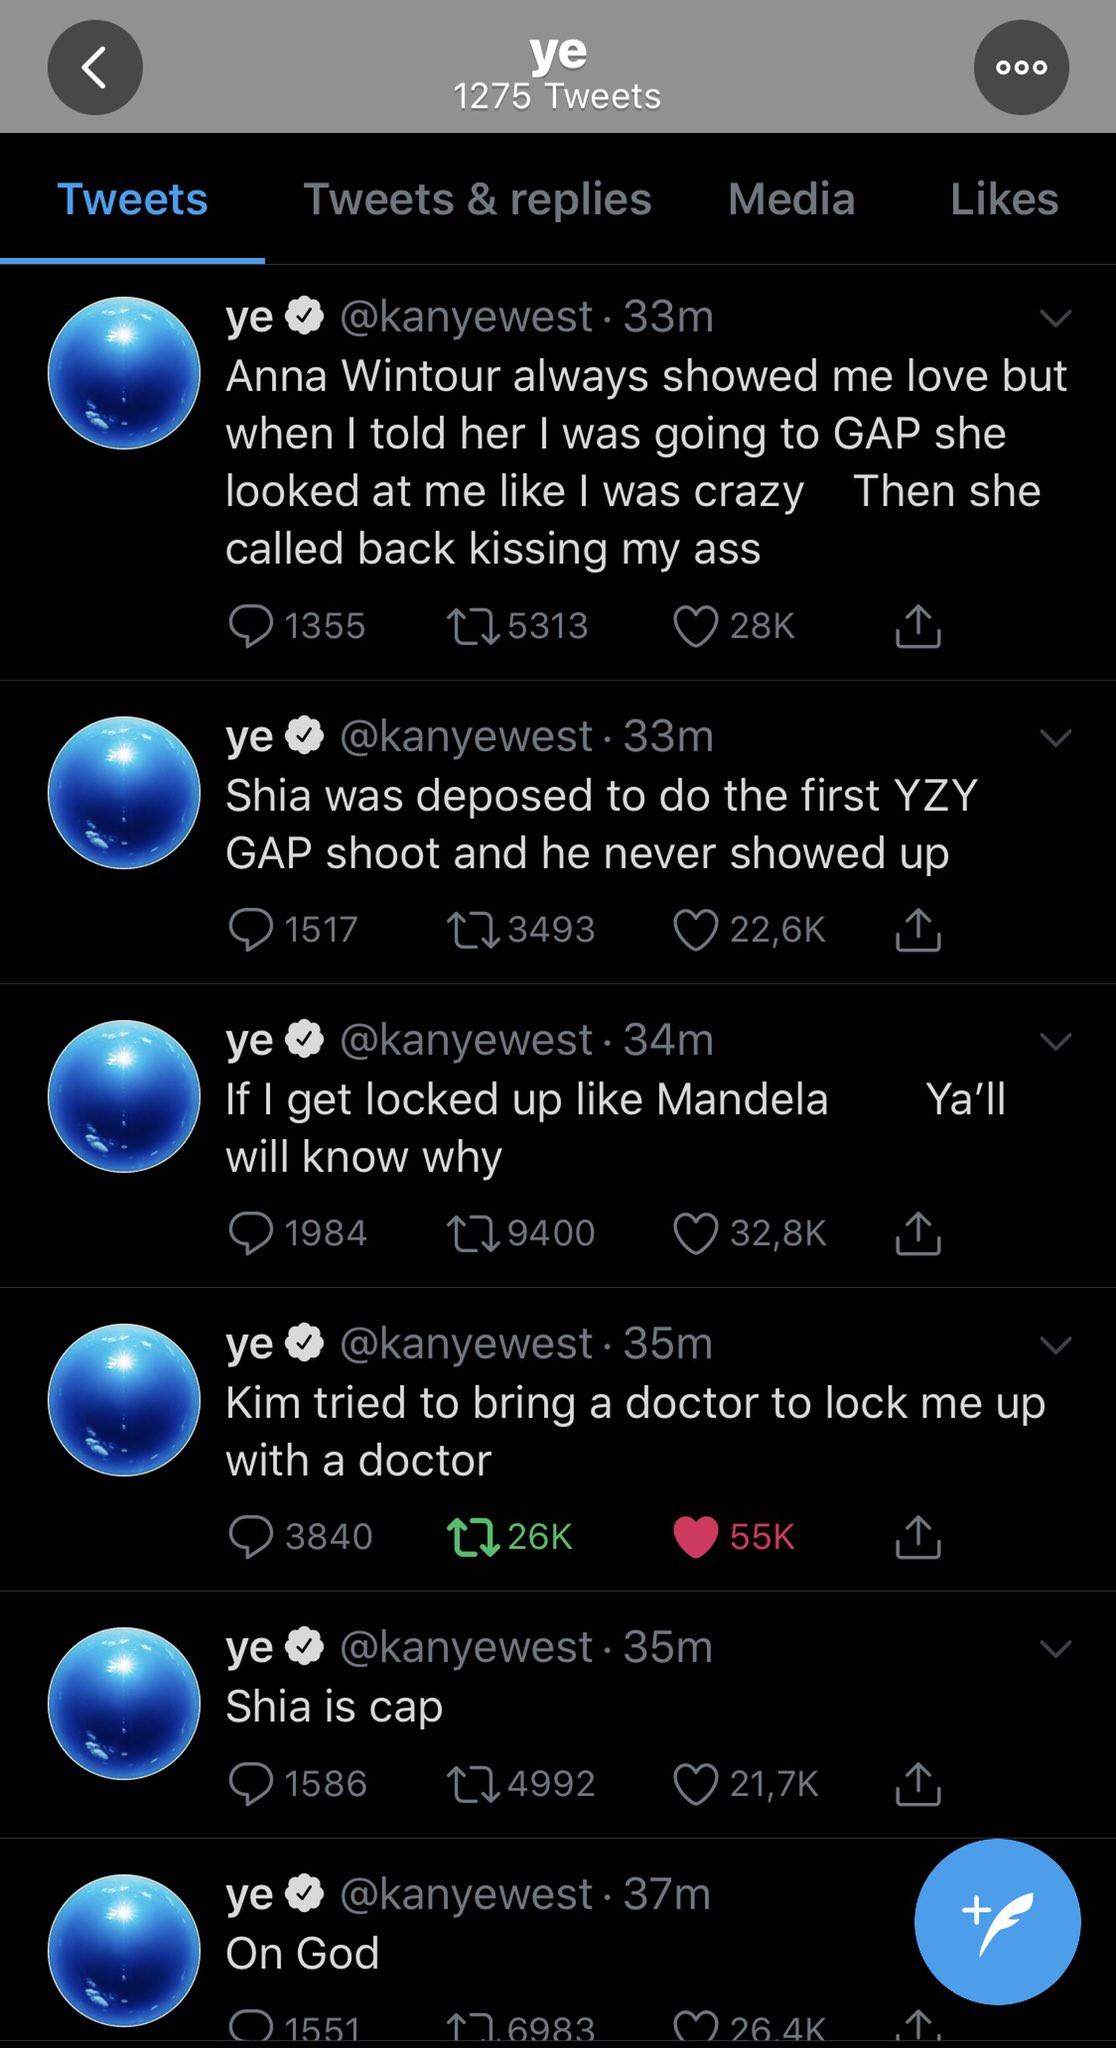 Kanye West rants on Twitter, calls out Kim Kardashian and Kris Jenner lindaikejisblog 5